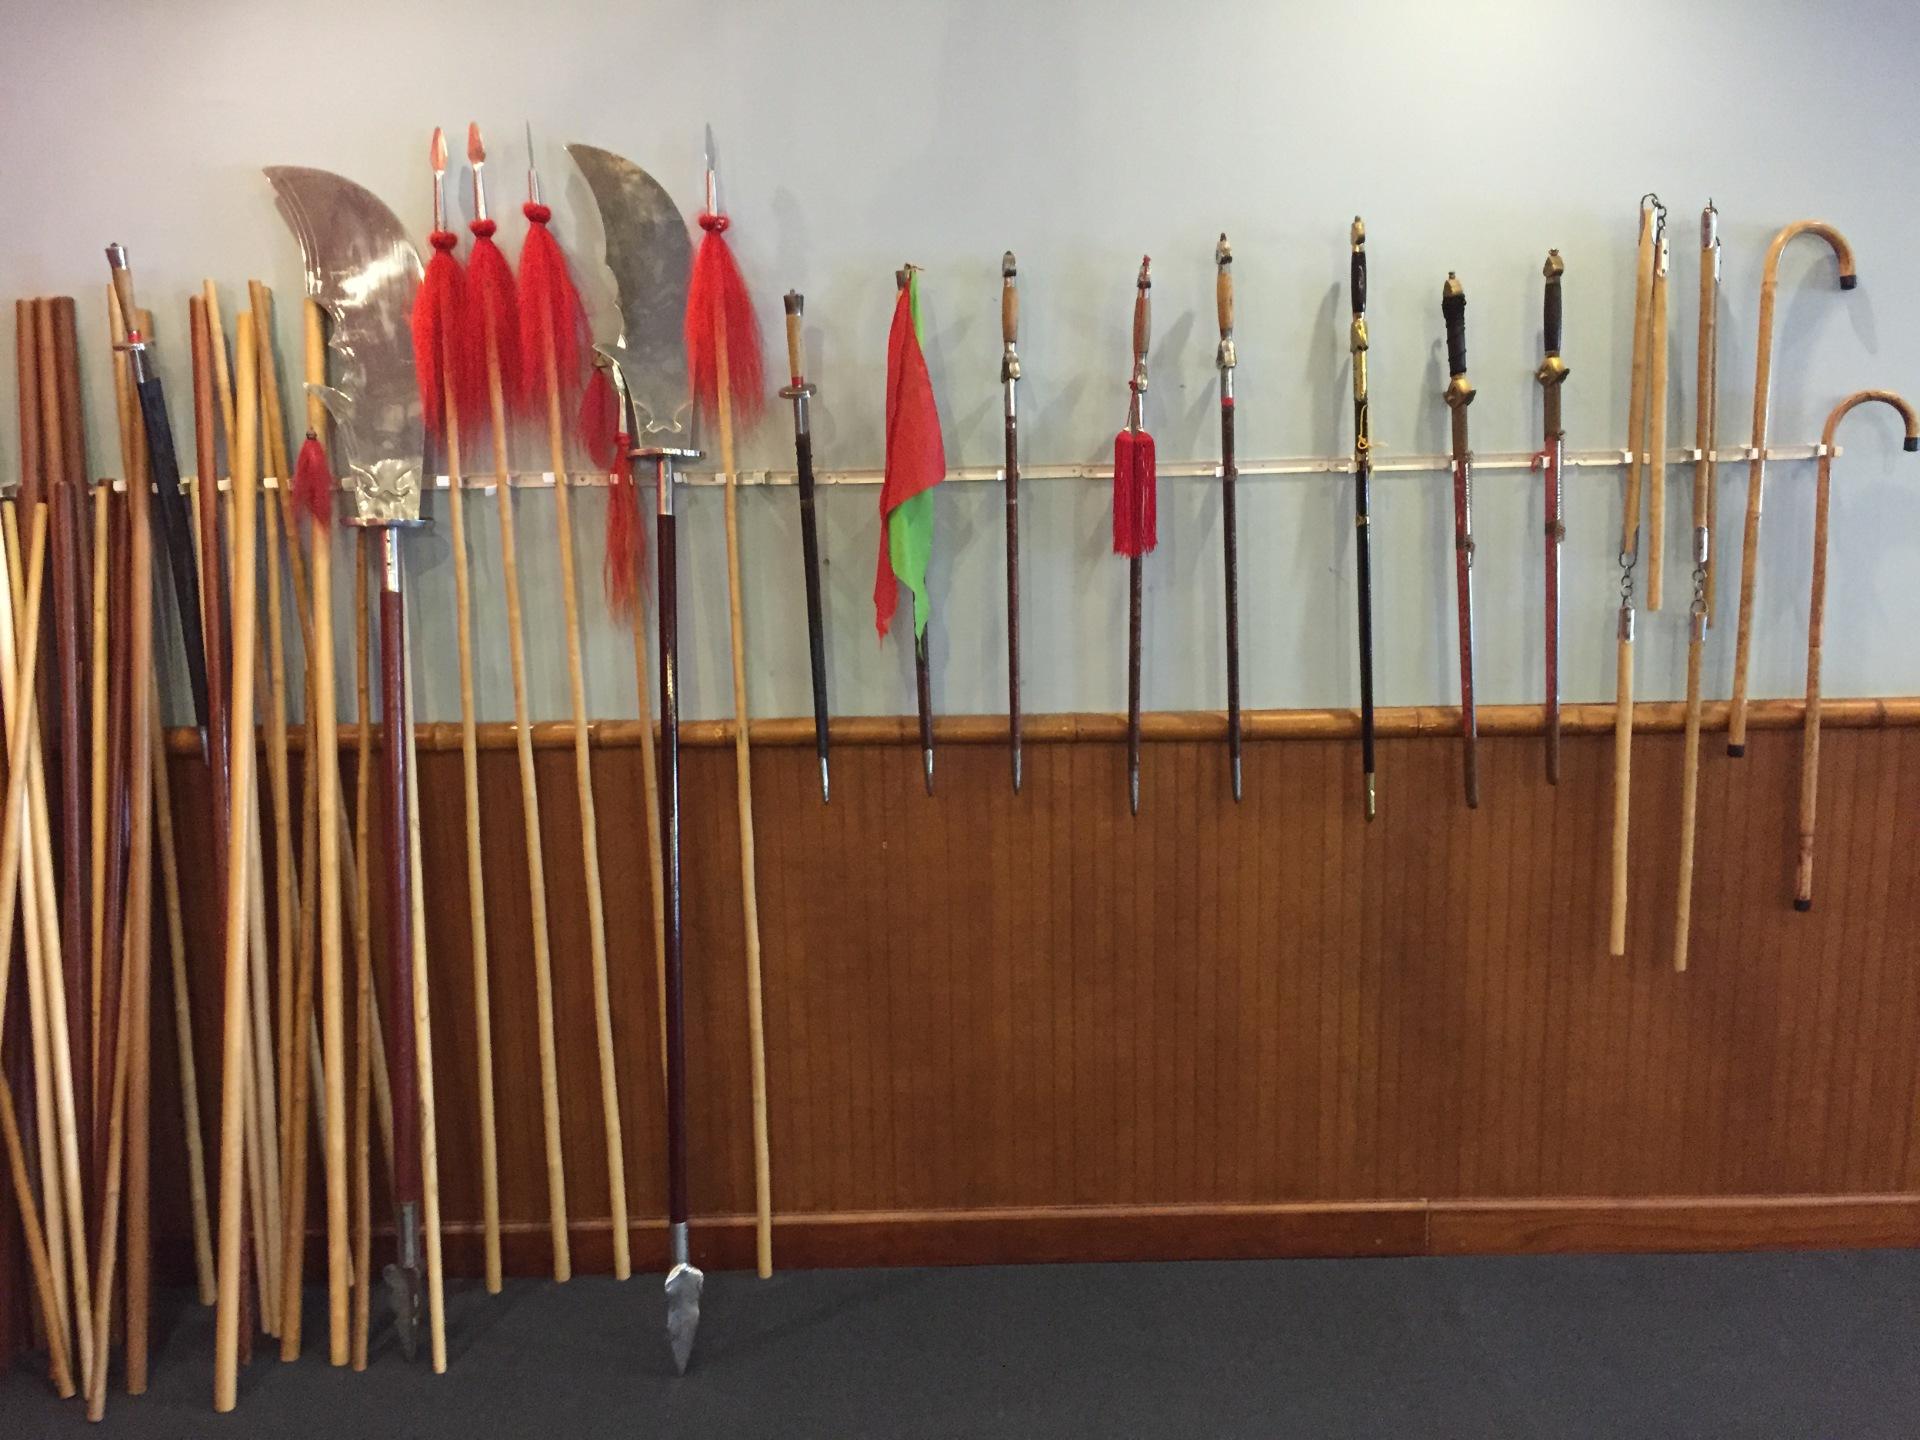 Wushu Weaponry